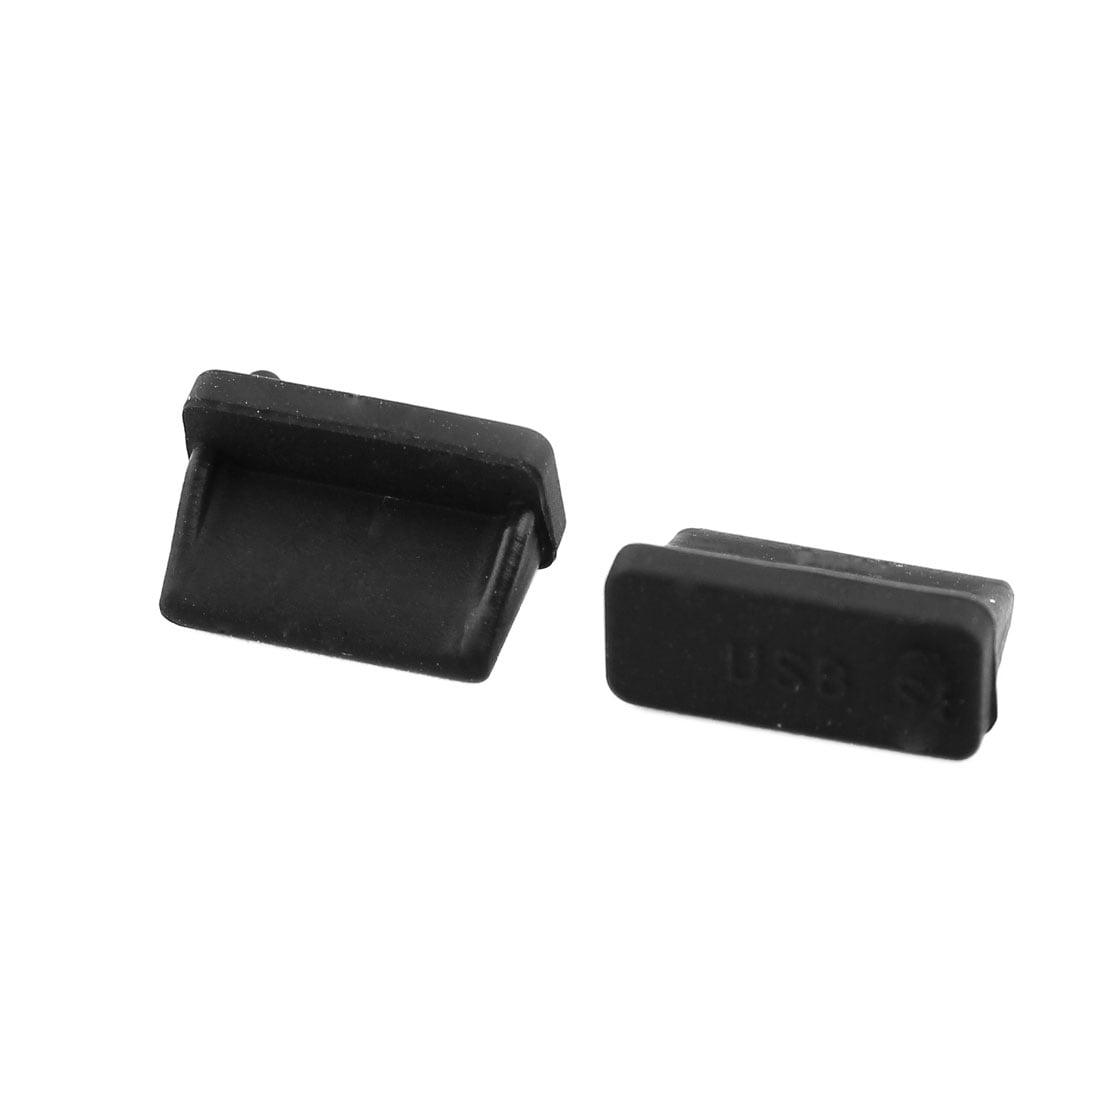 Computer USB 2.0 Female Port Dust Dustproof Cover Cap Protector Black 20 Pcs - image 1 of 3